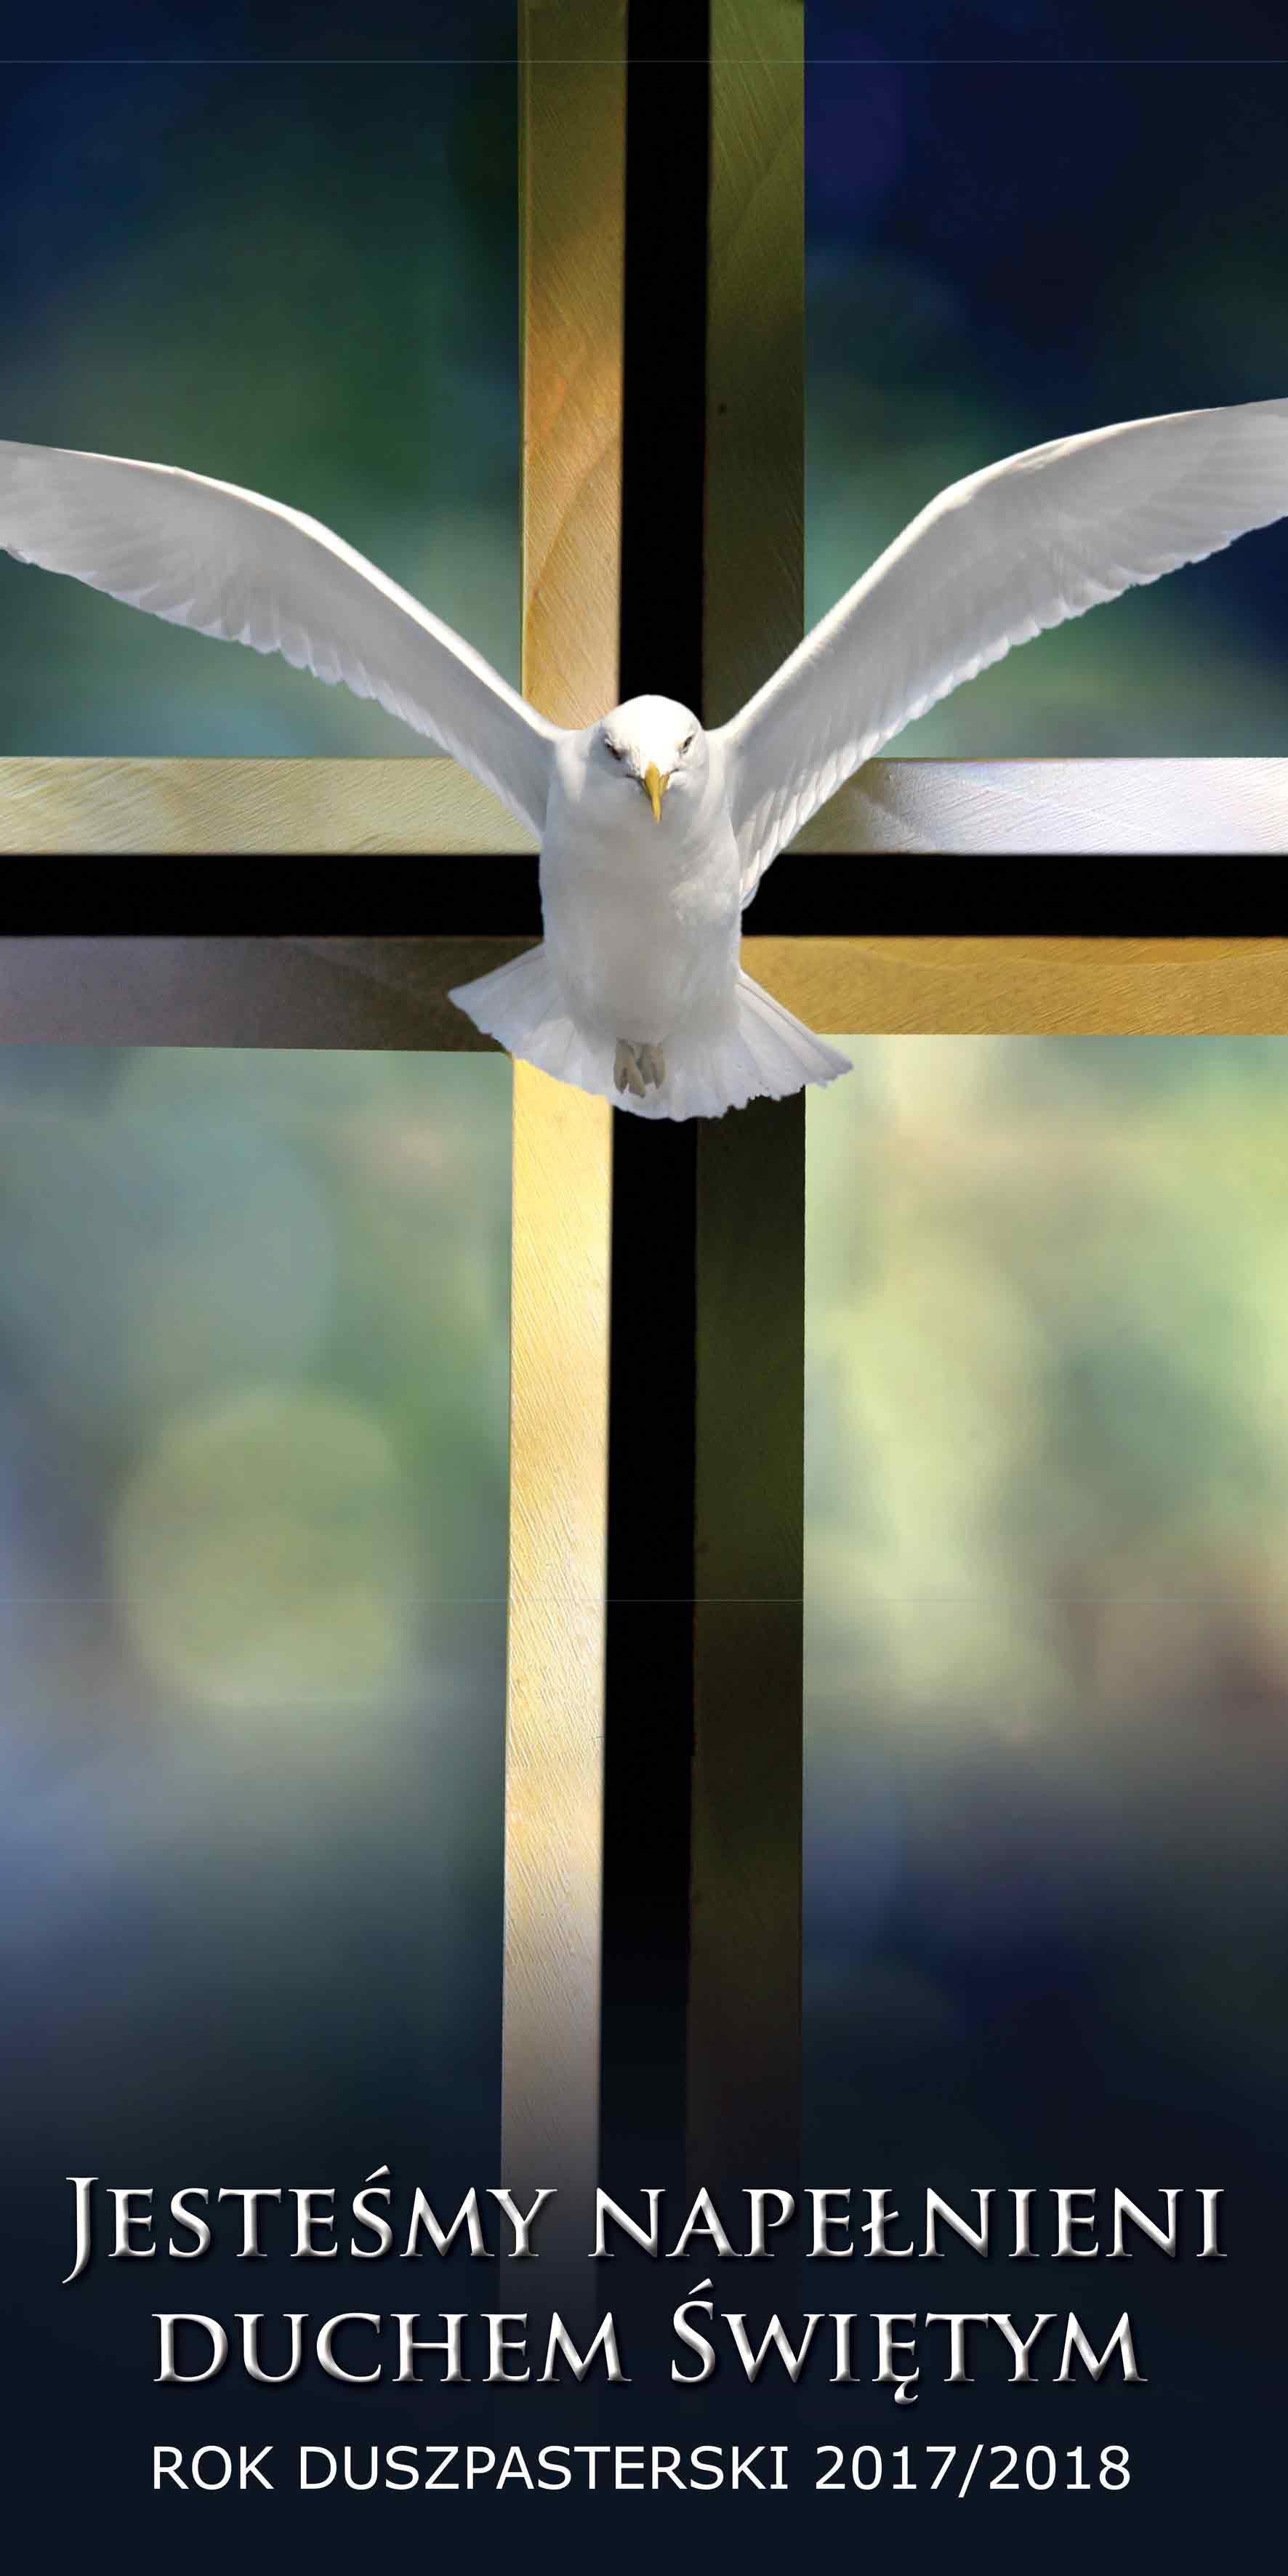 Duch ktory umacnia w milosc - Baner religijny